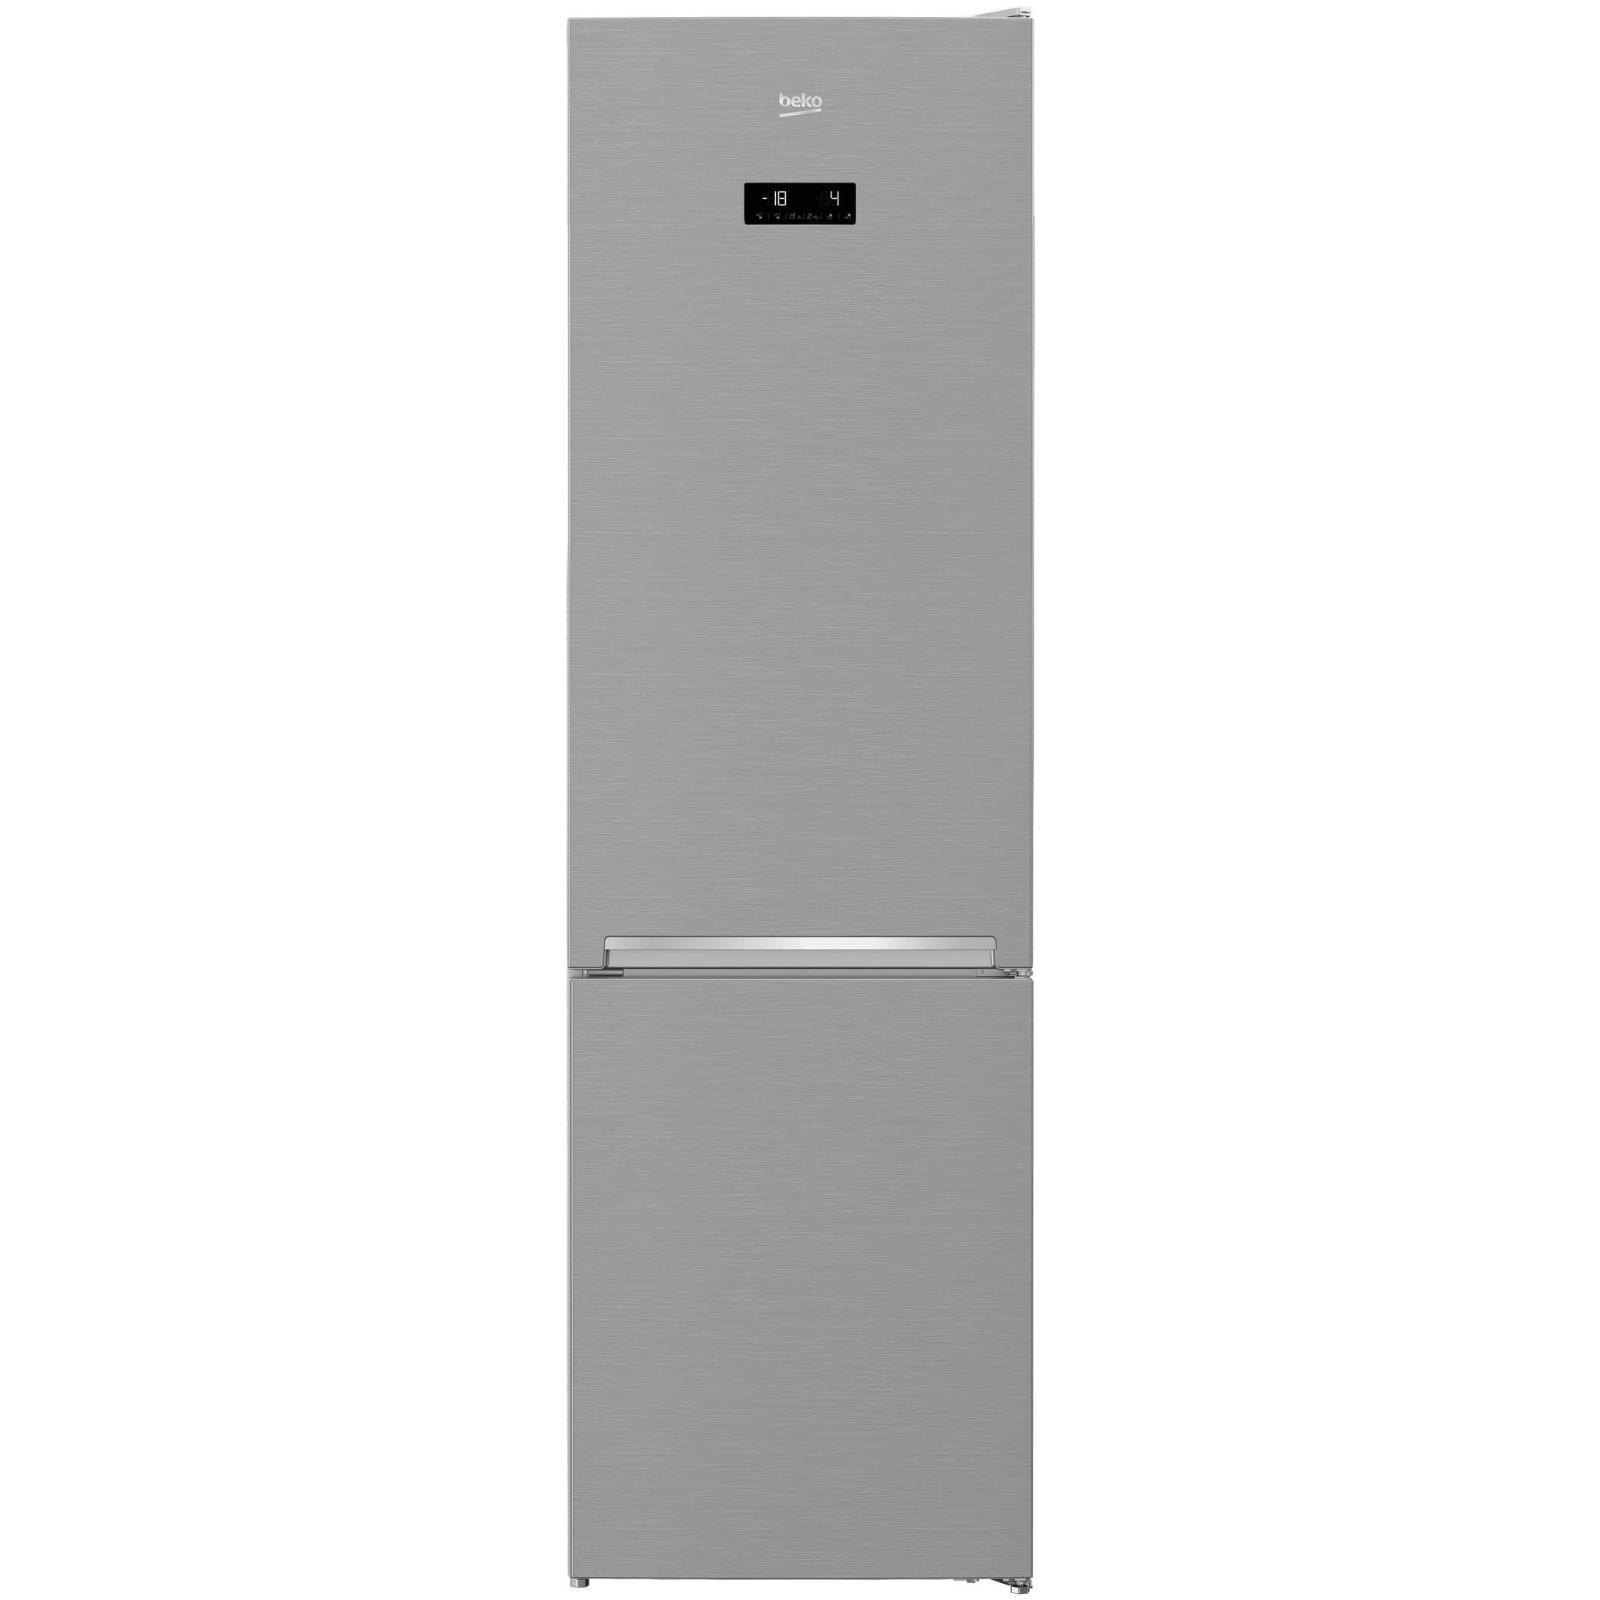 Fotografie Combina frigorifica BEKO RCNA406E30ZXB, 362 l, NeoFrost Dual Cooling, Touch control, Raft sticle, H 203 cm, Clasa A++, Argintiu